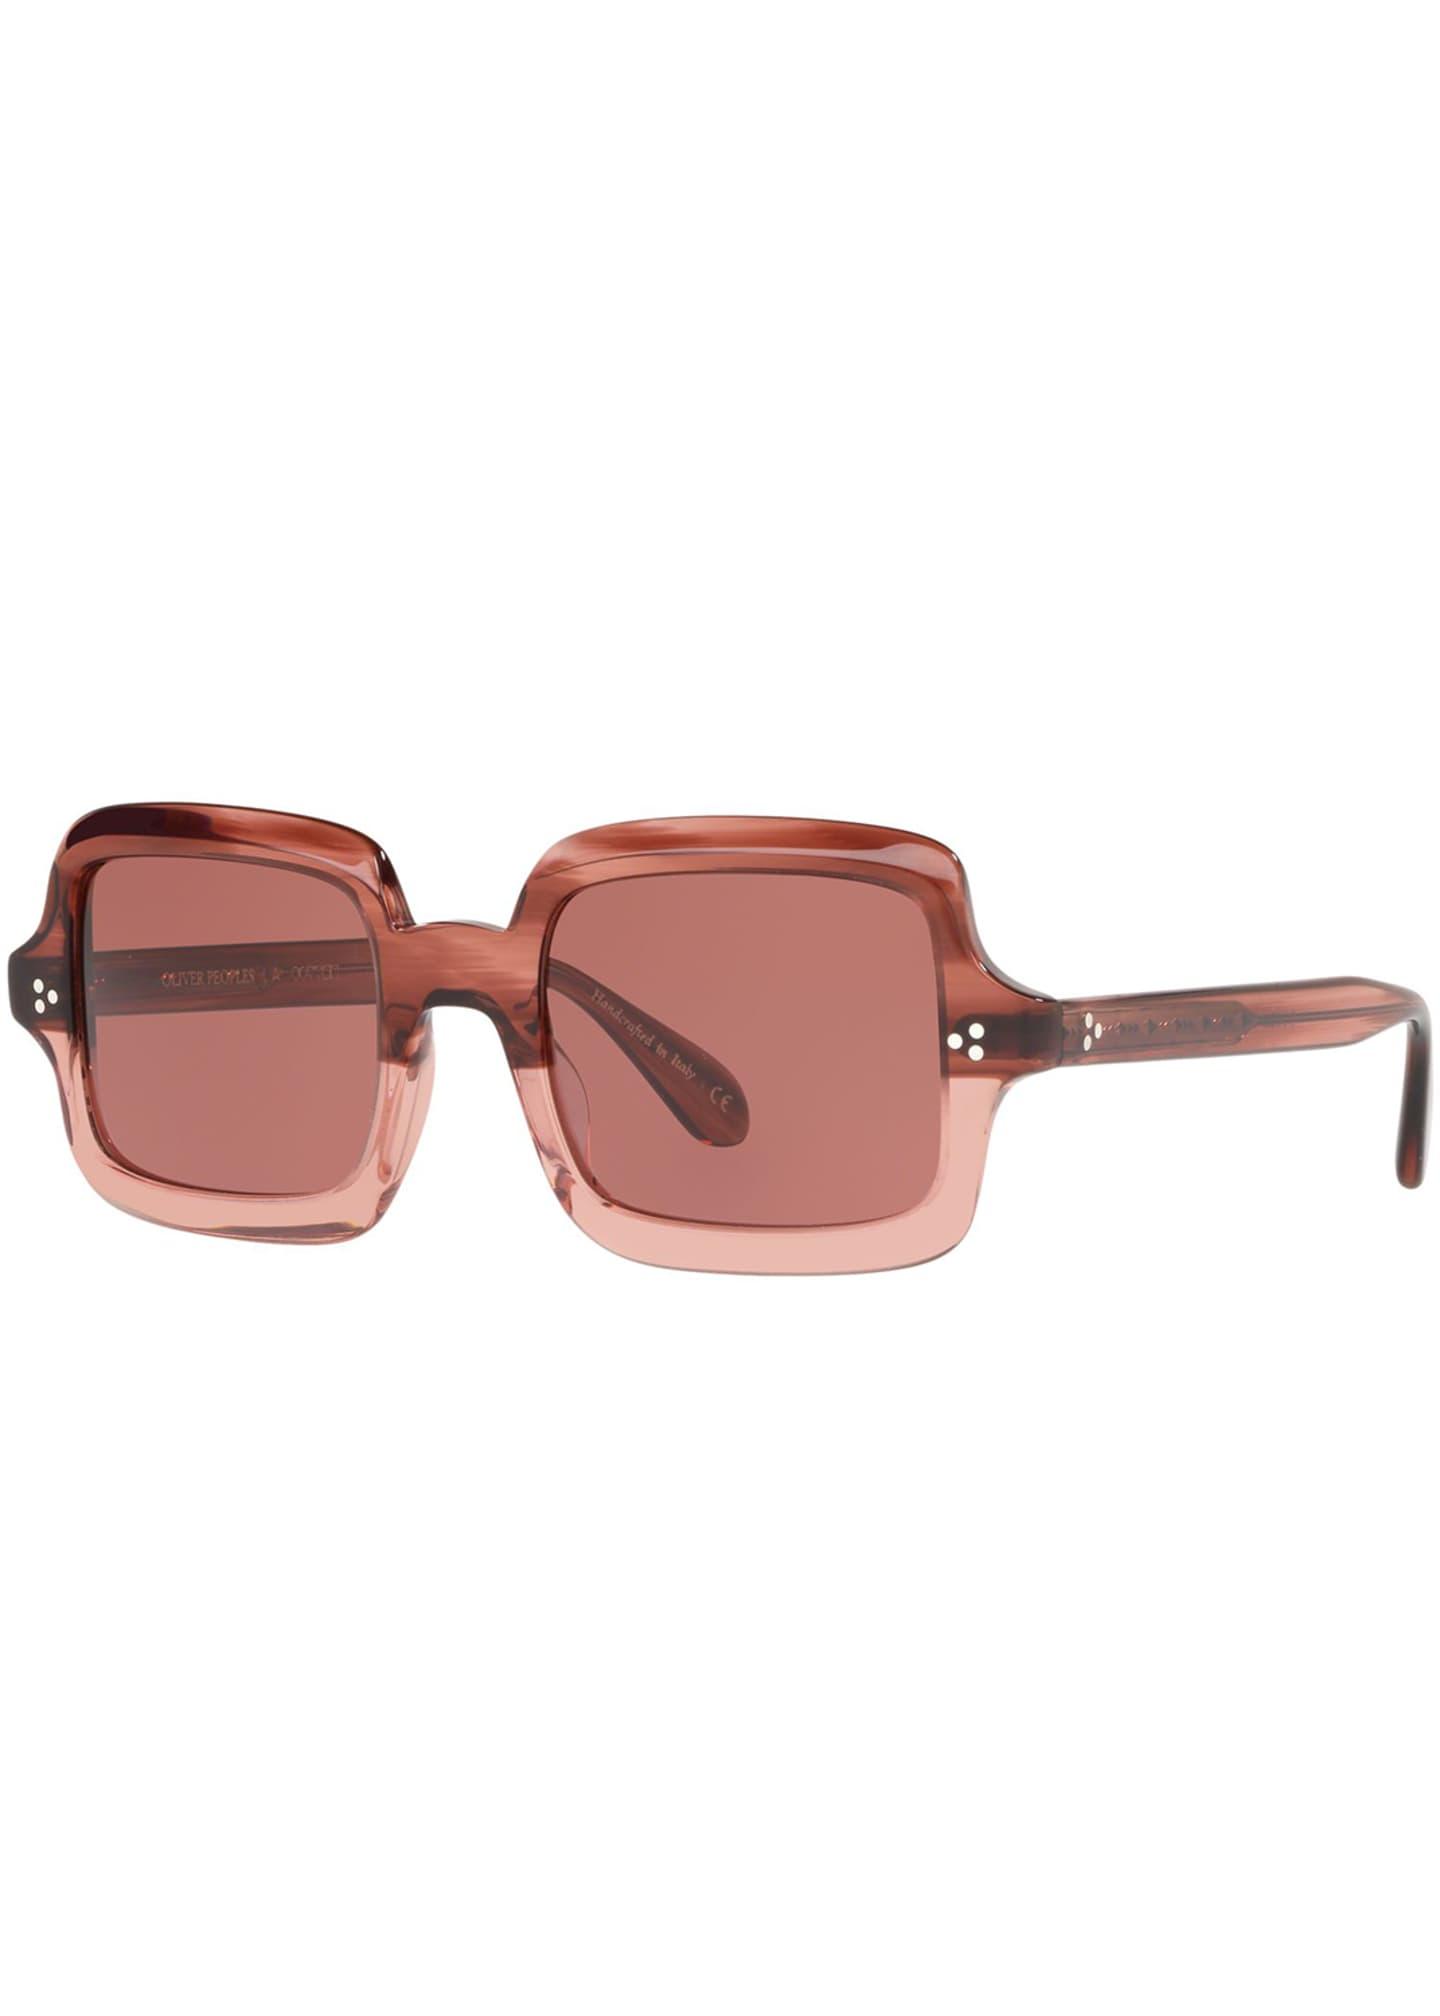 Oliver Peoples Avri Square Polarized Sunglasses